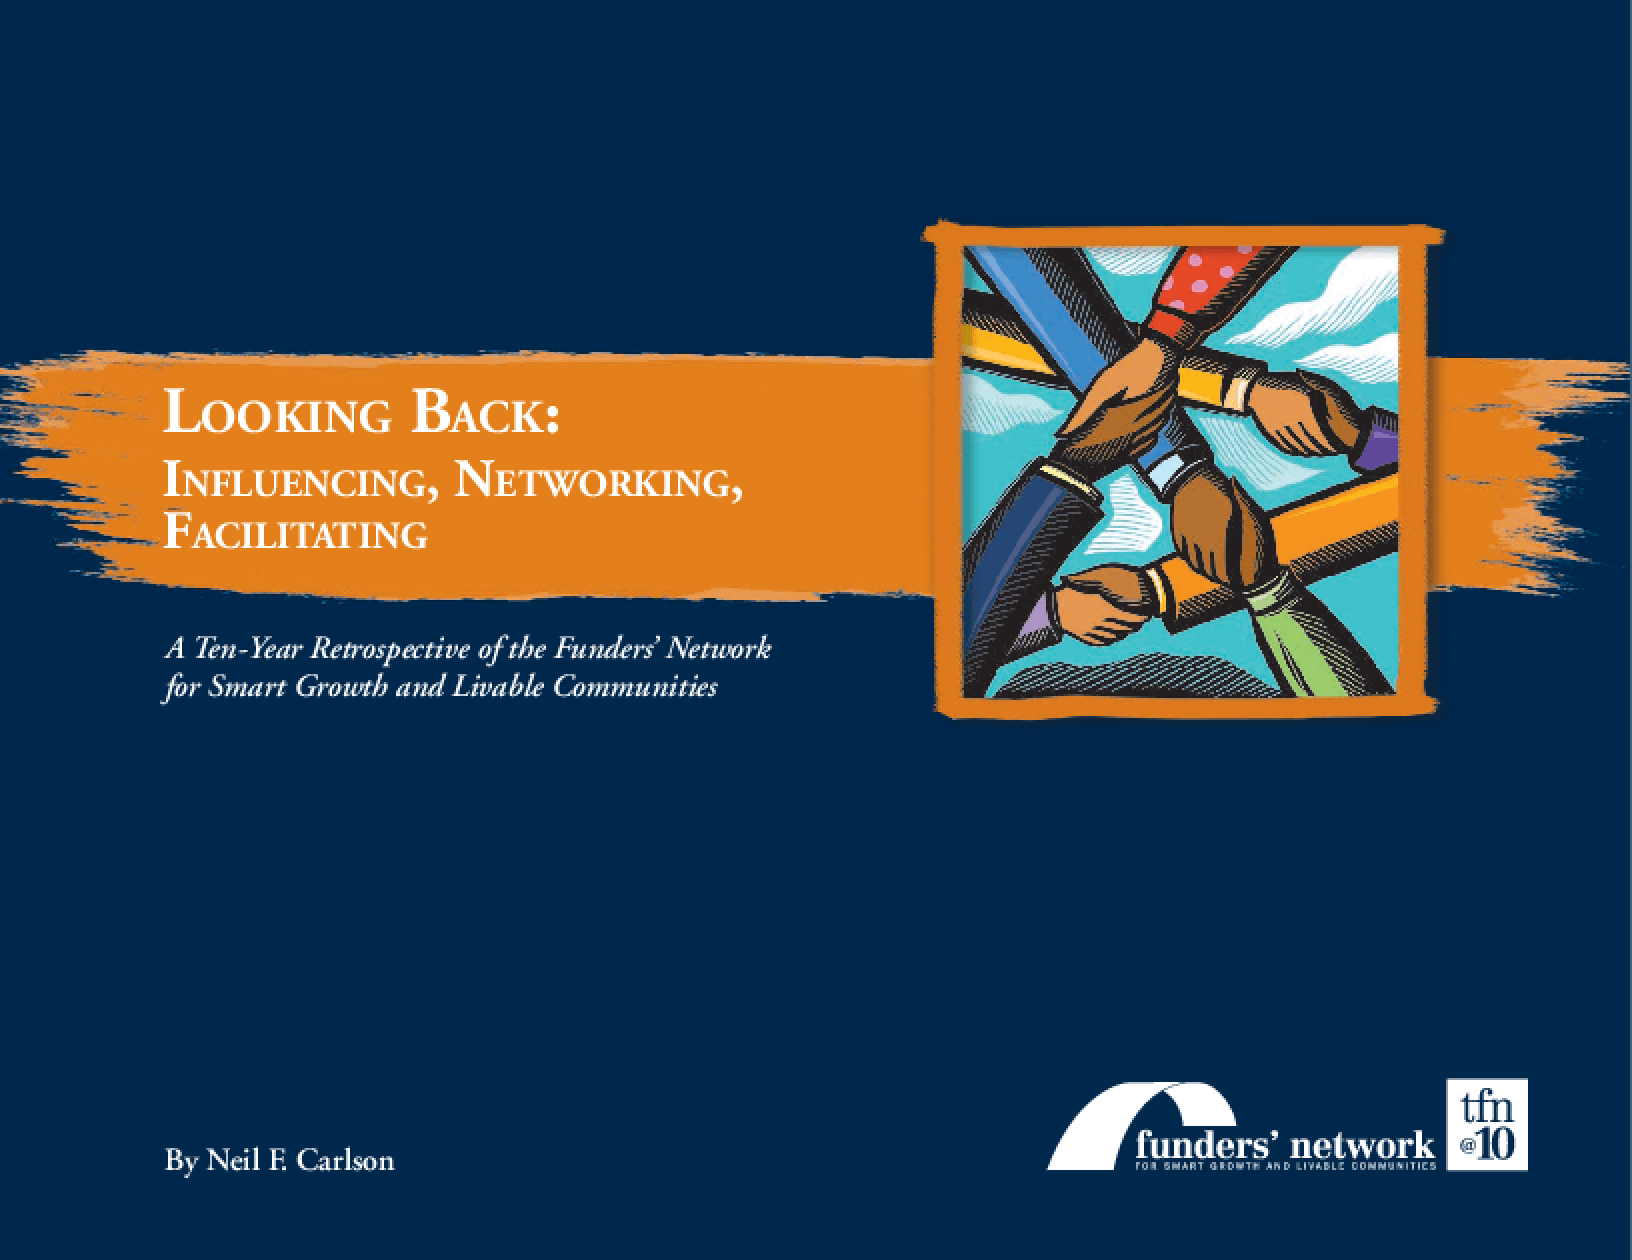 Looking Back: Influencing, Networking, Facilitating